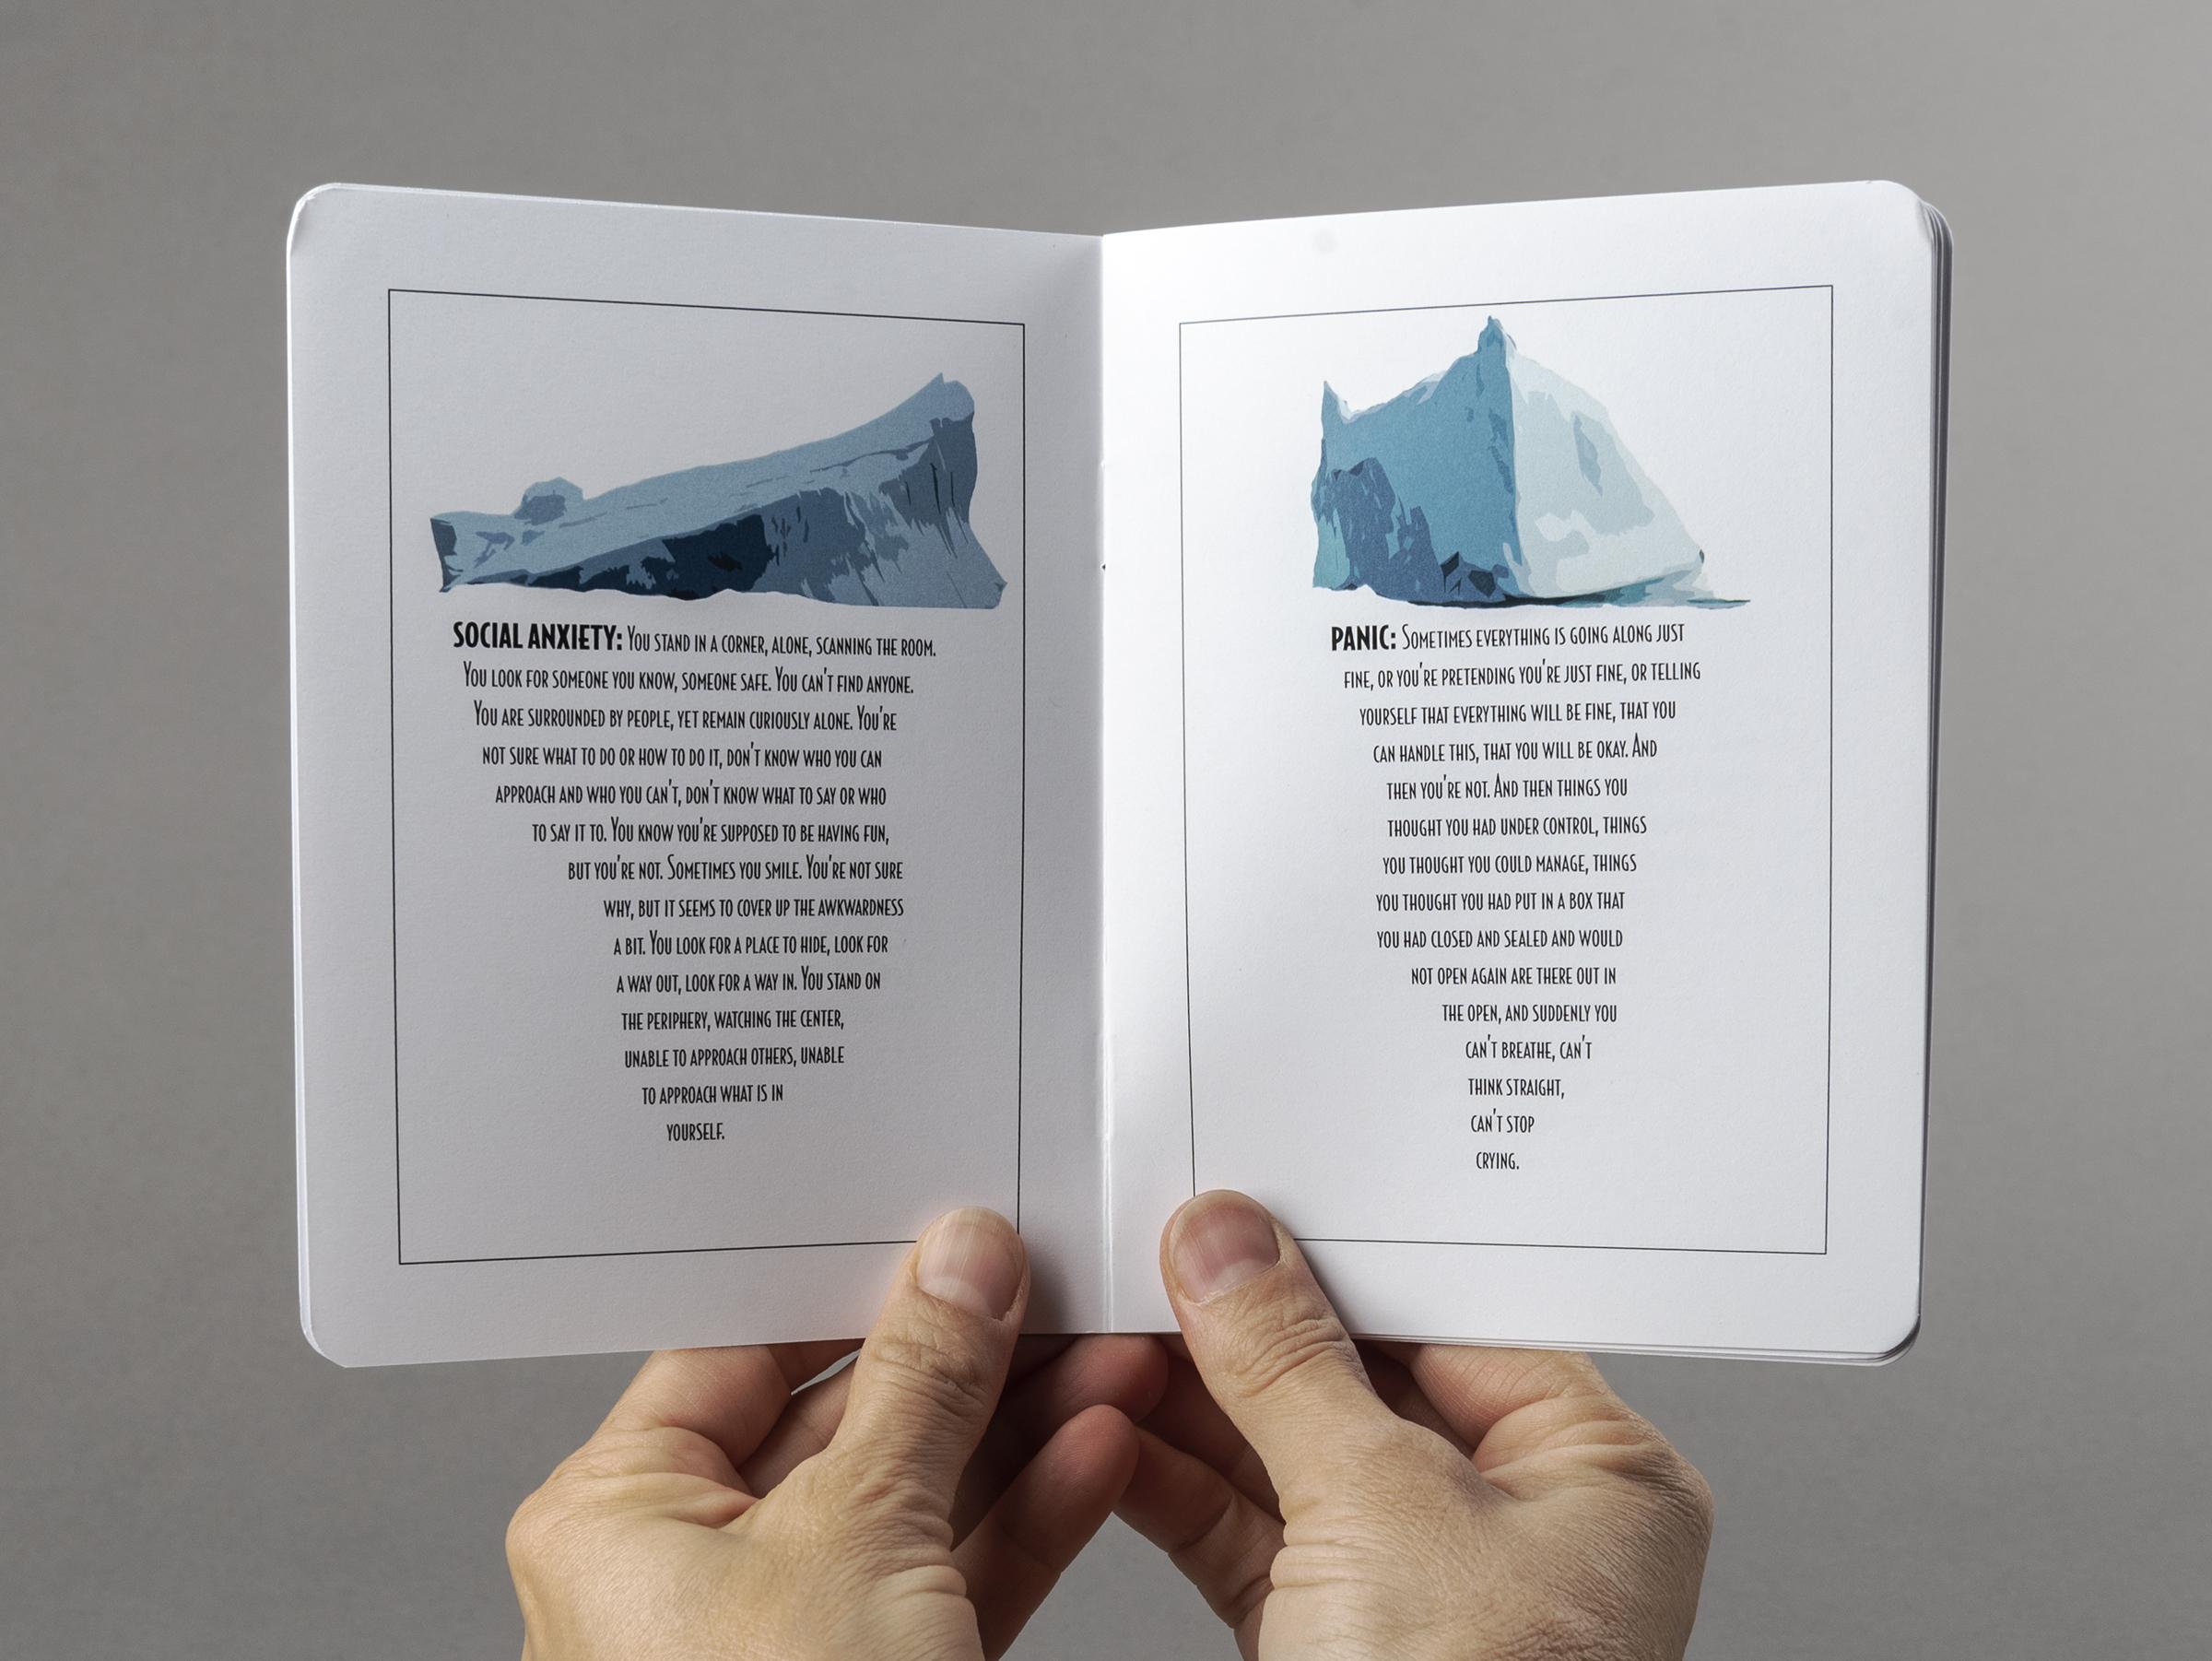 icebergopenhands.jpg